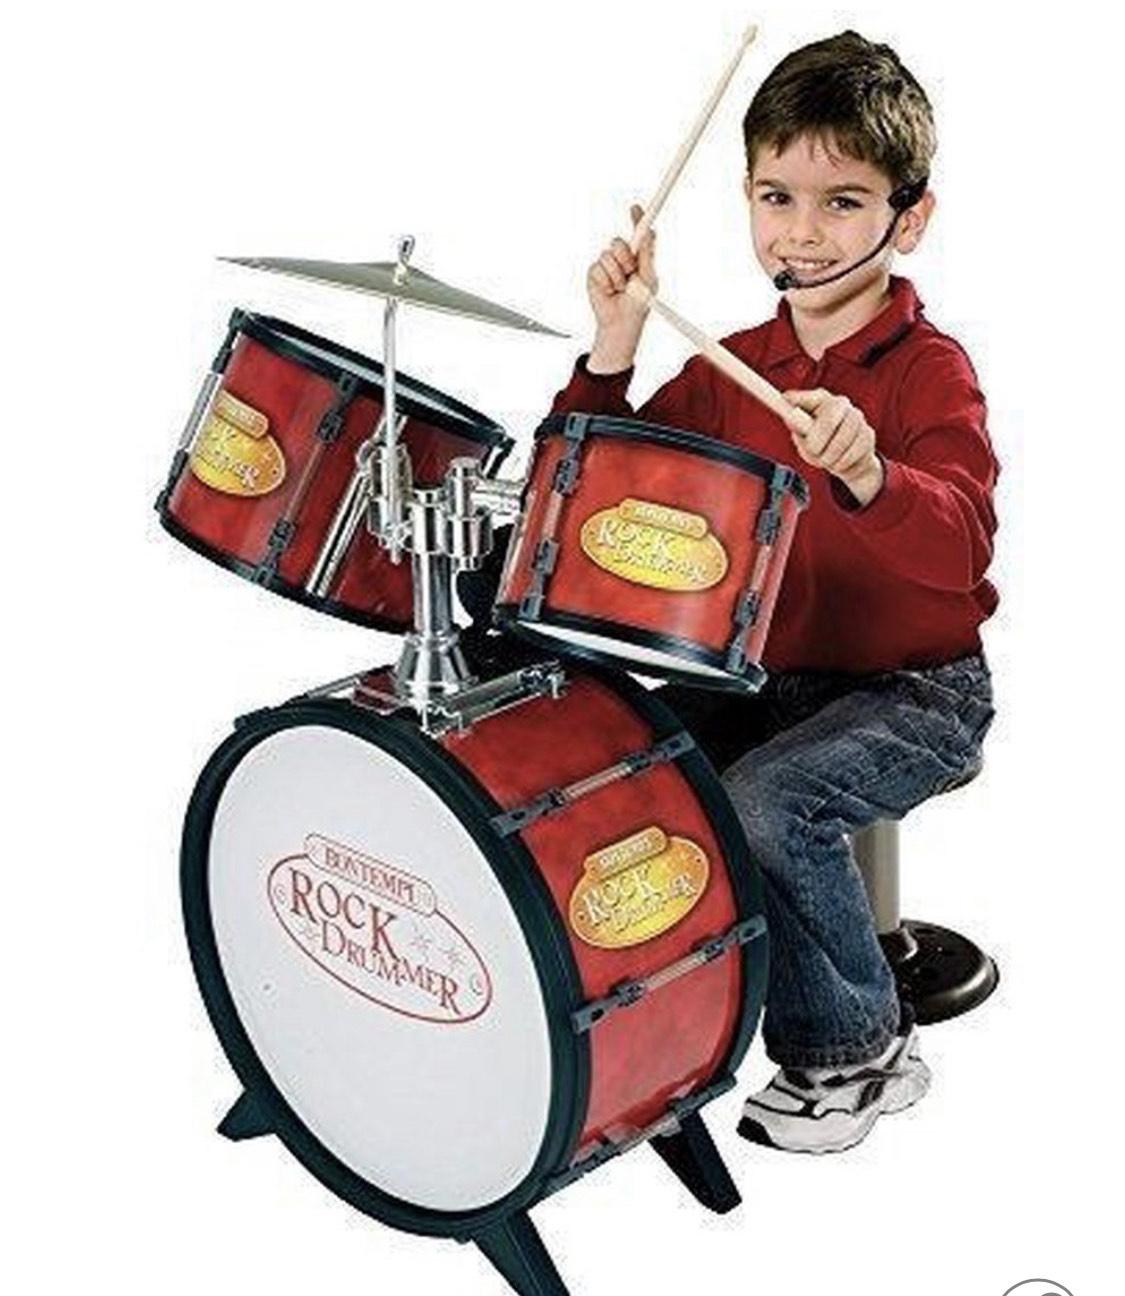 Bontempi Drumstel voor kinderen @ Bol.com plaza